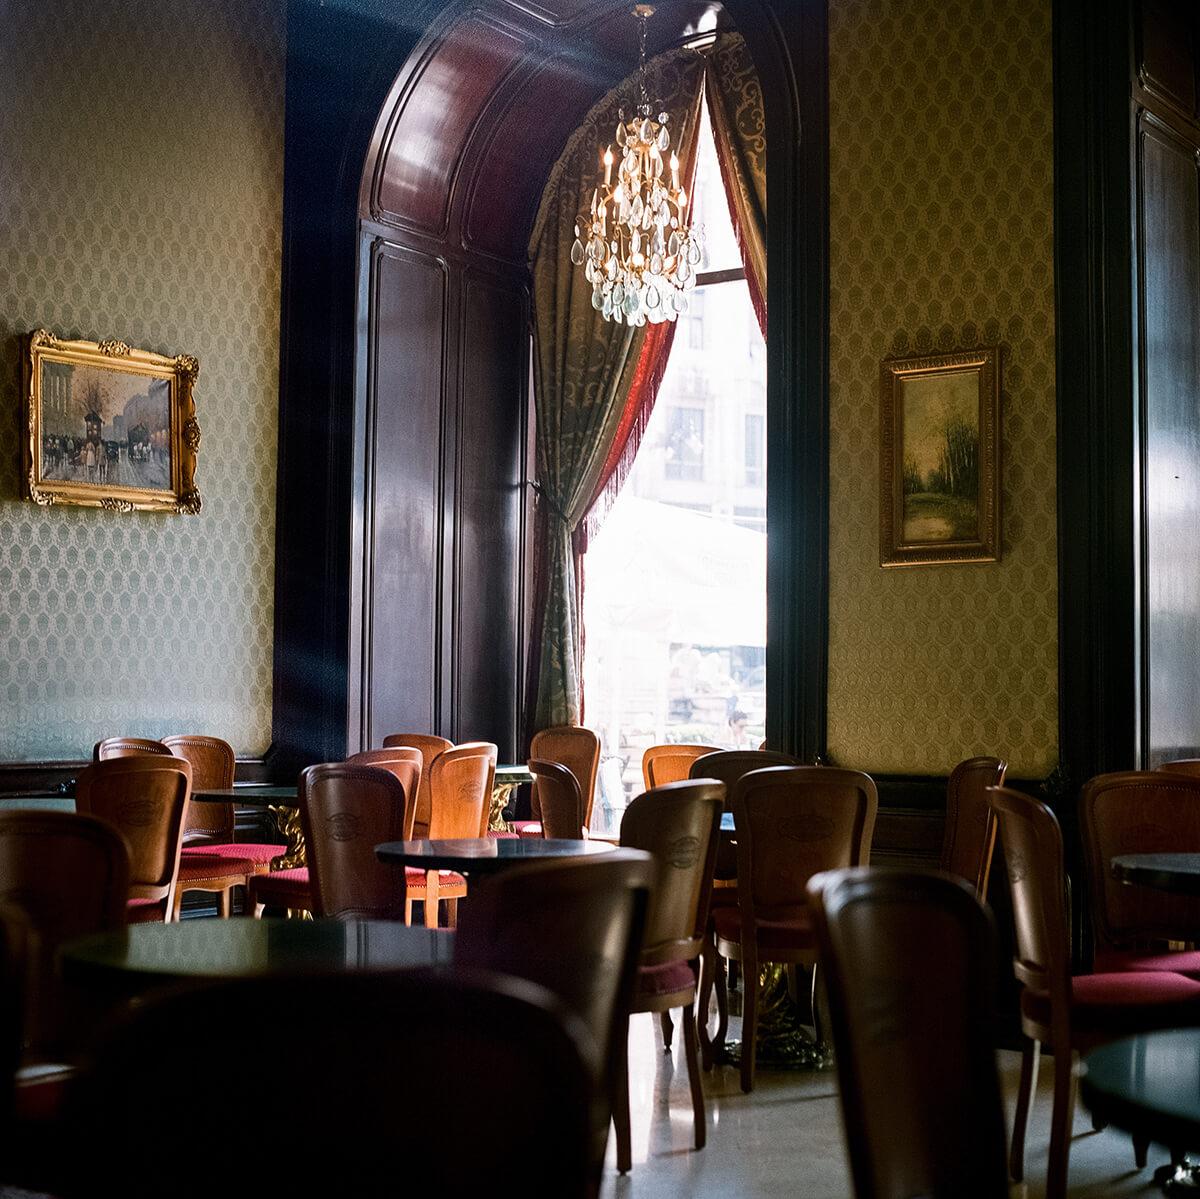 Gerbeaud Coffeehouse Budapest (c) Lomoherz